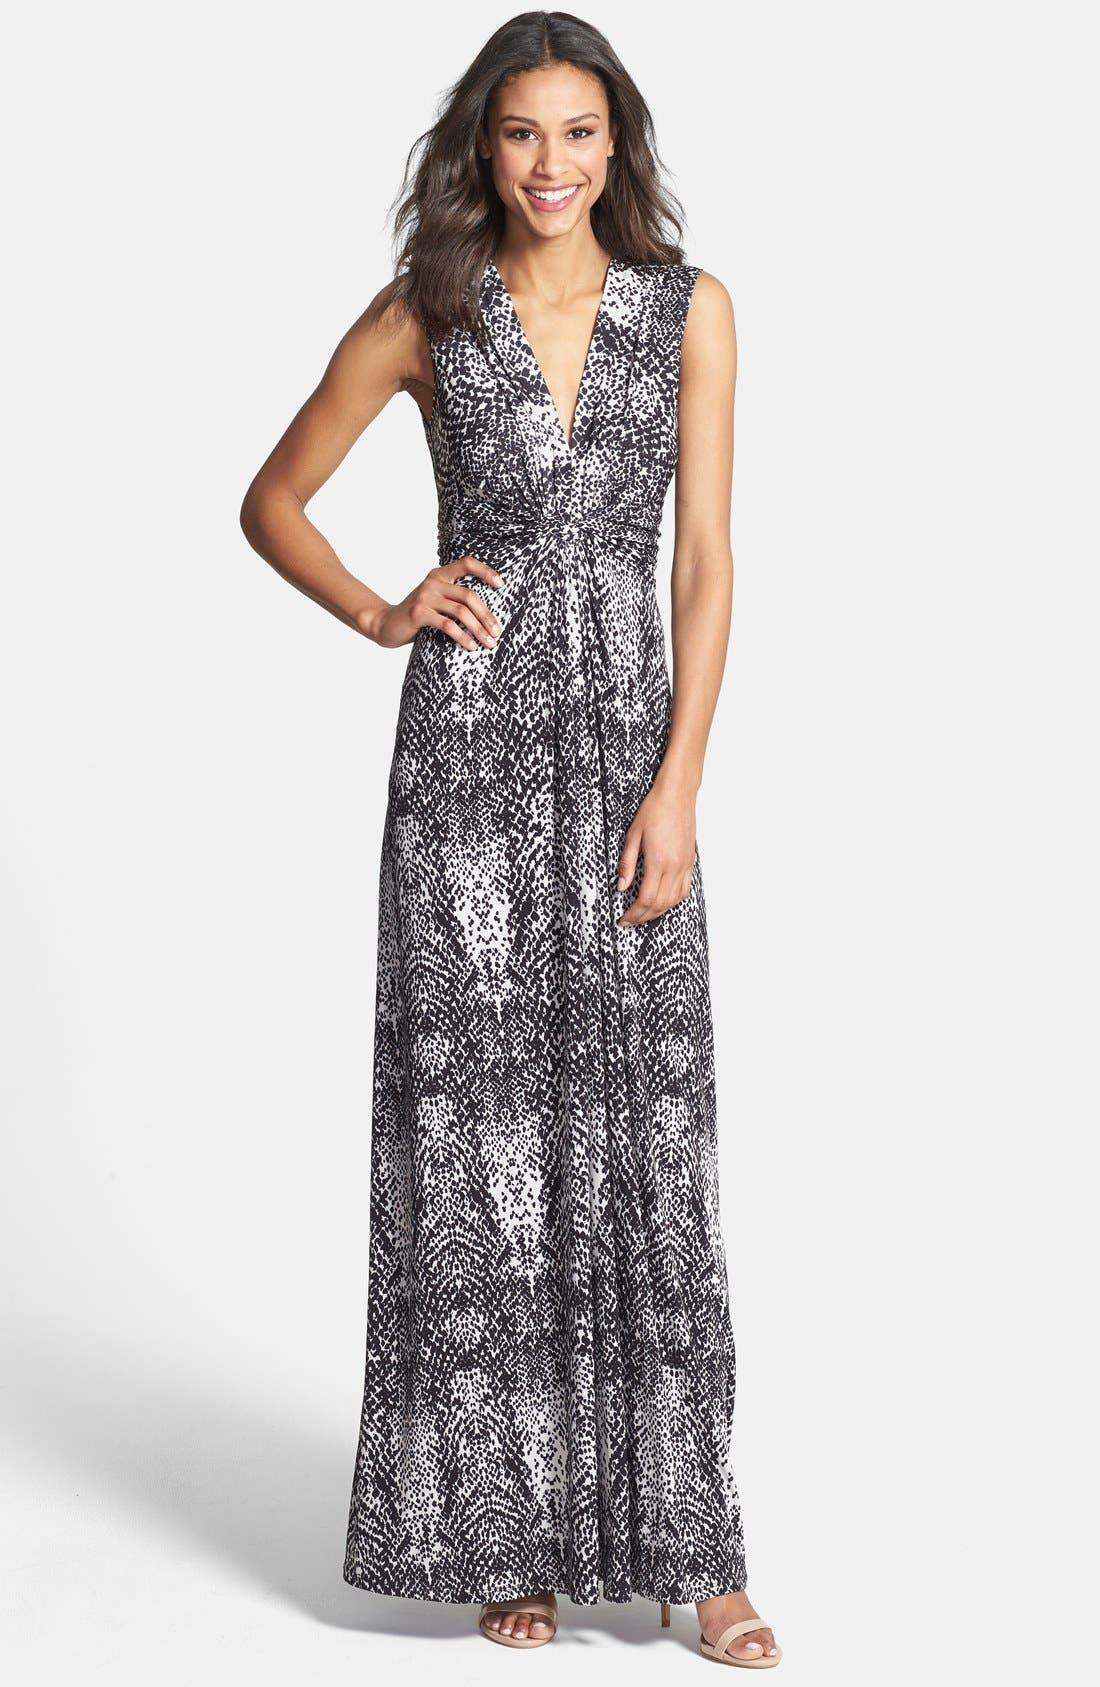 Alternate Image 1 Selected - Eliza J Print Front Knot Jersey Maxi Dress